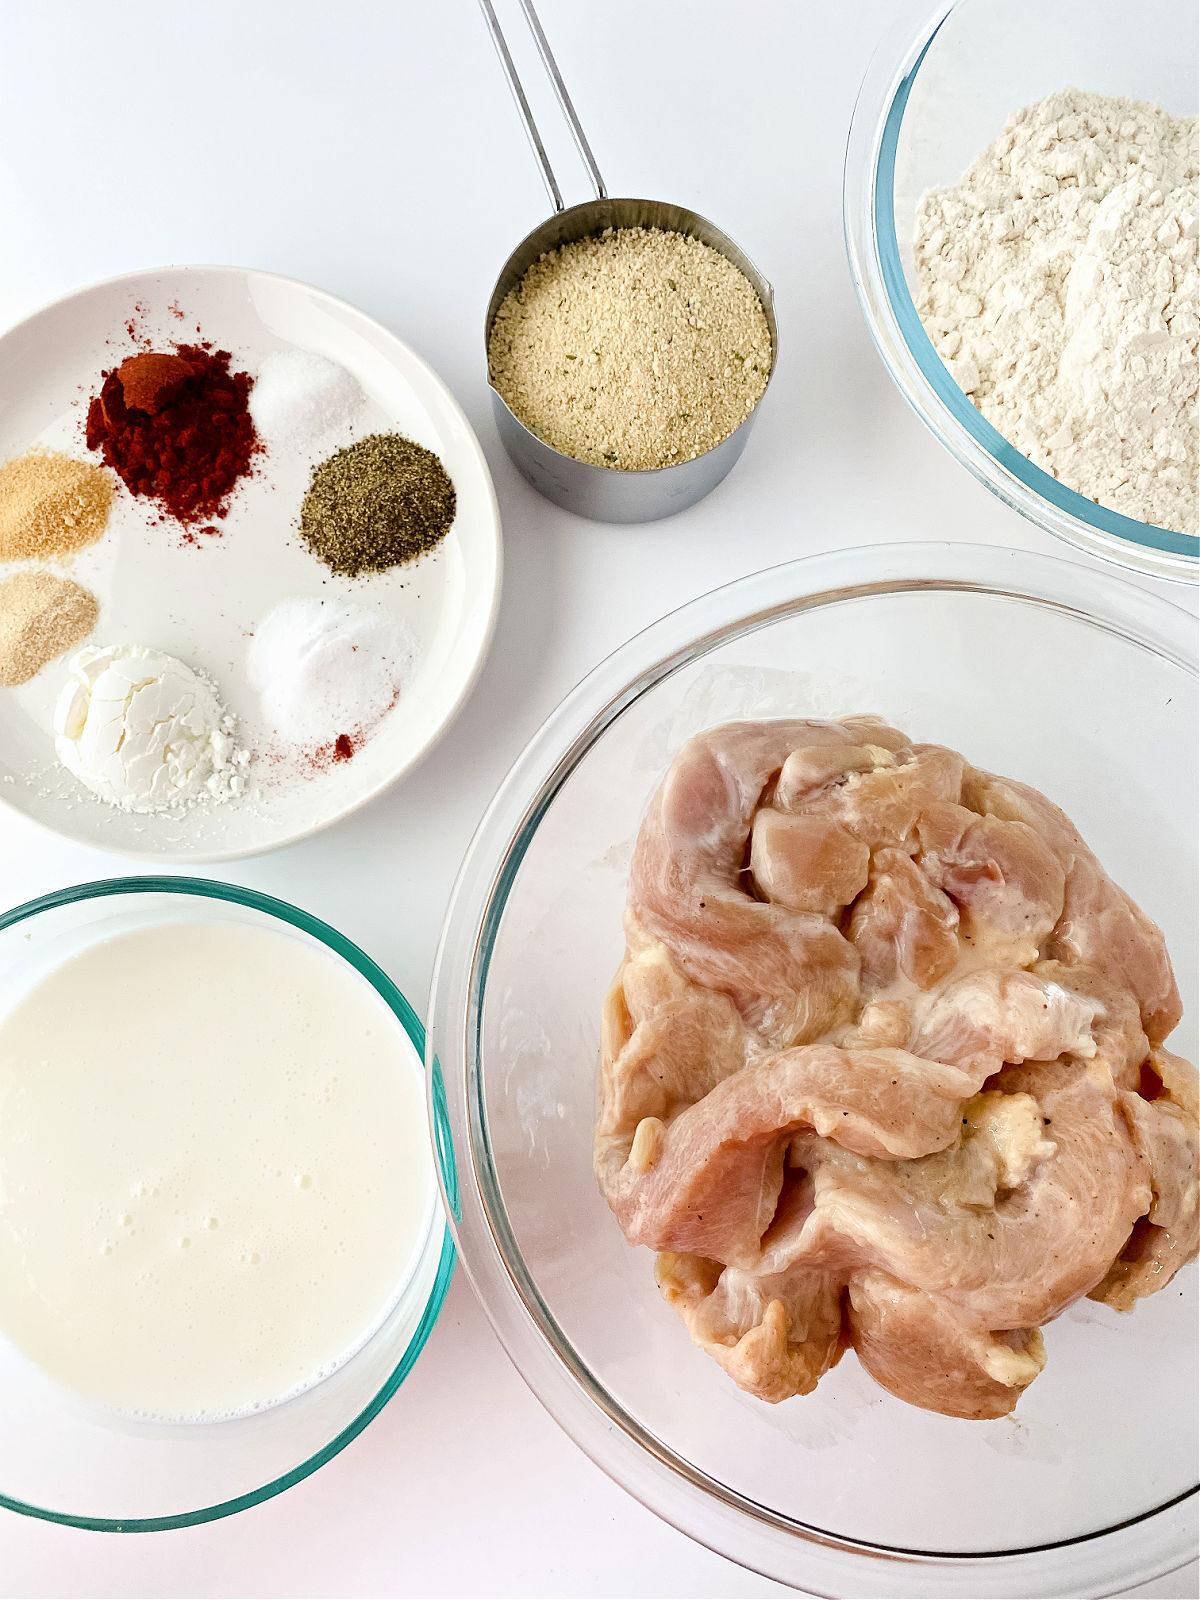 Sliced chicken breasts, seasoning, buttermilk, and breadcrumbs.